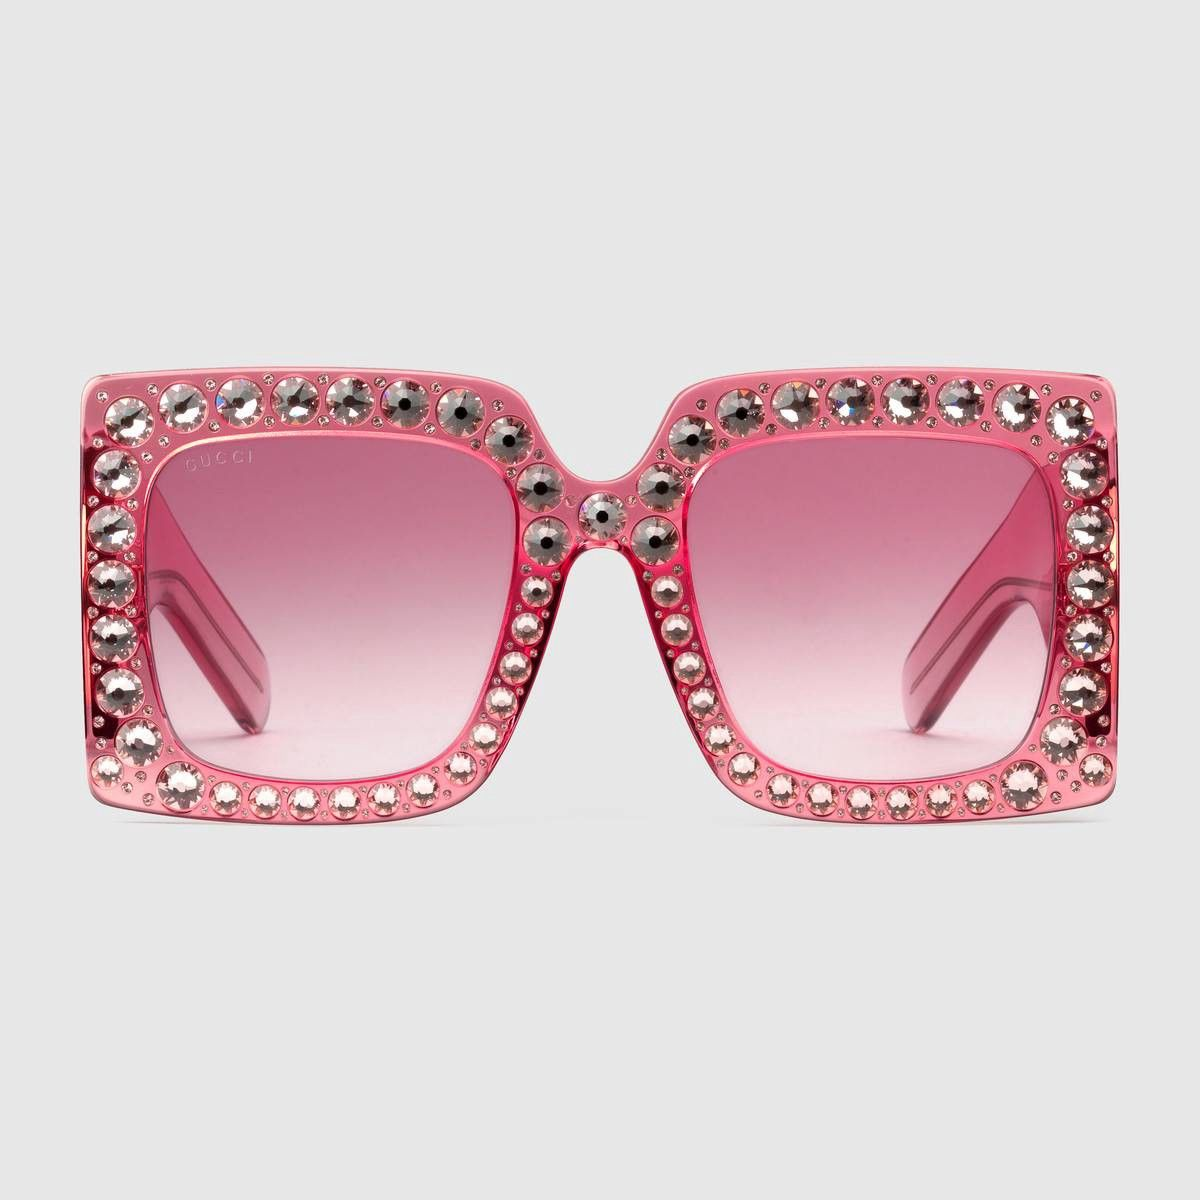 6d3a8ed7991ed GUCCI Oversize square-frame acetate sunglasses - pink acetate.  gucci